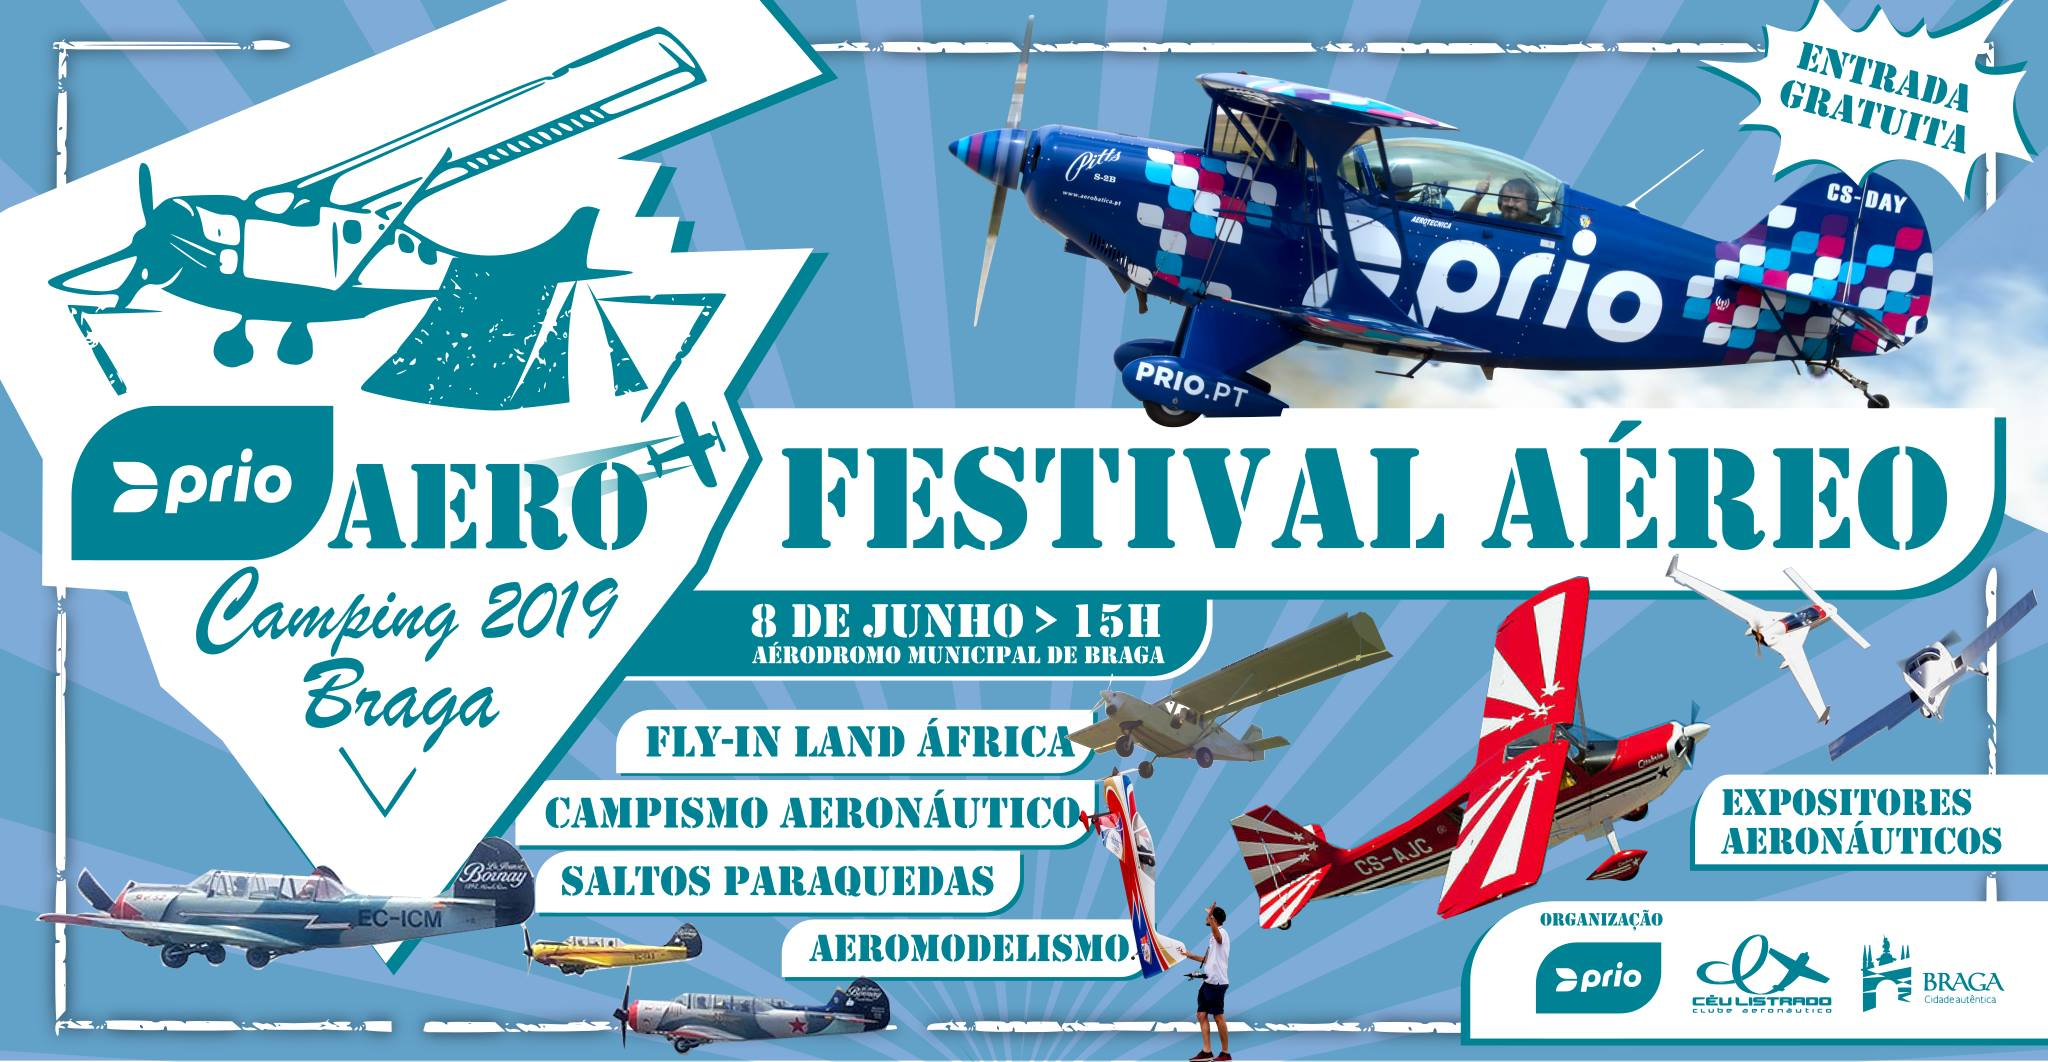 AERO Camping 2019 Braga